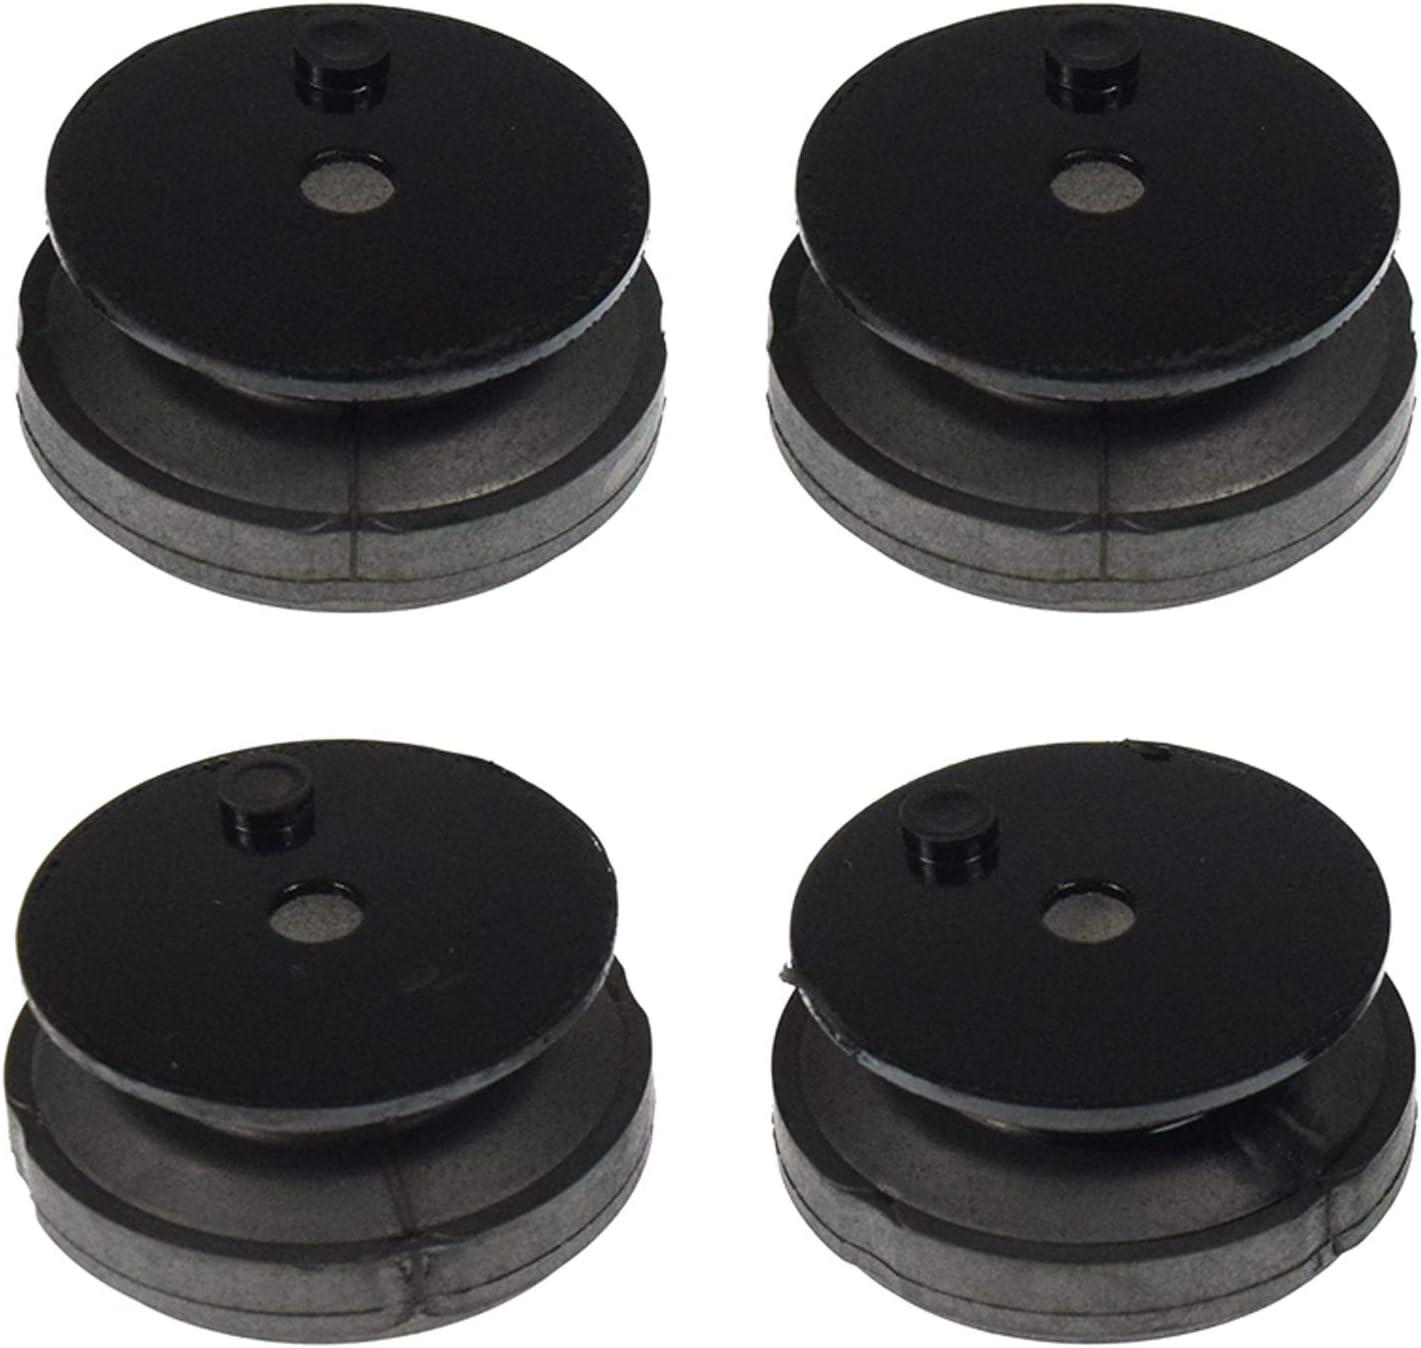 4pcs 68325-Z07-003 Generators Lower Rubber Feet Pads EB2000i /& EU2000i for Honda